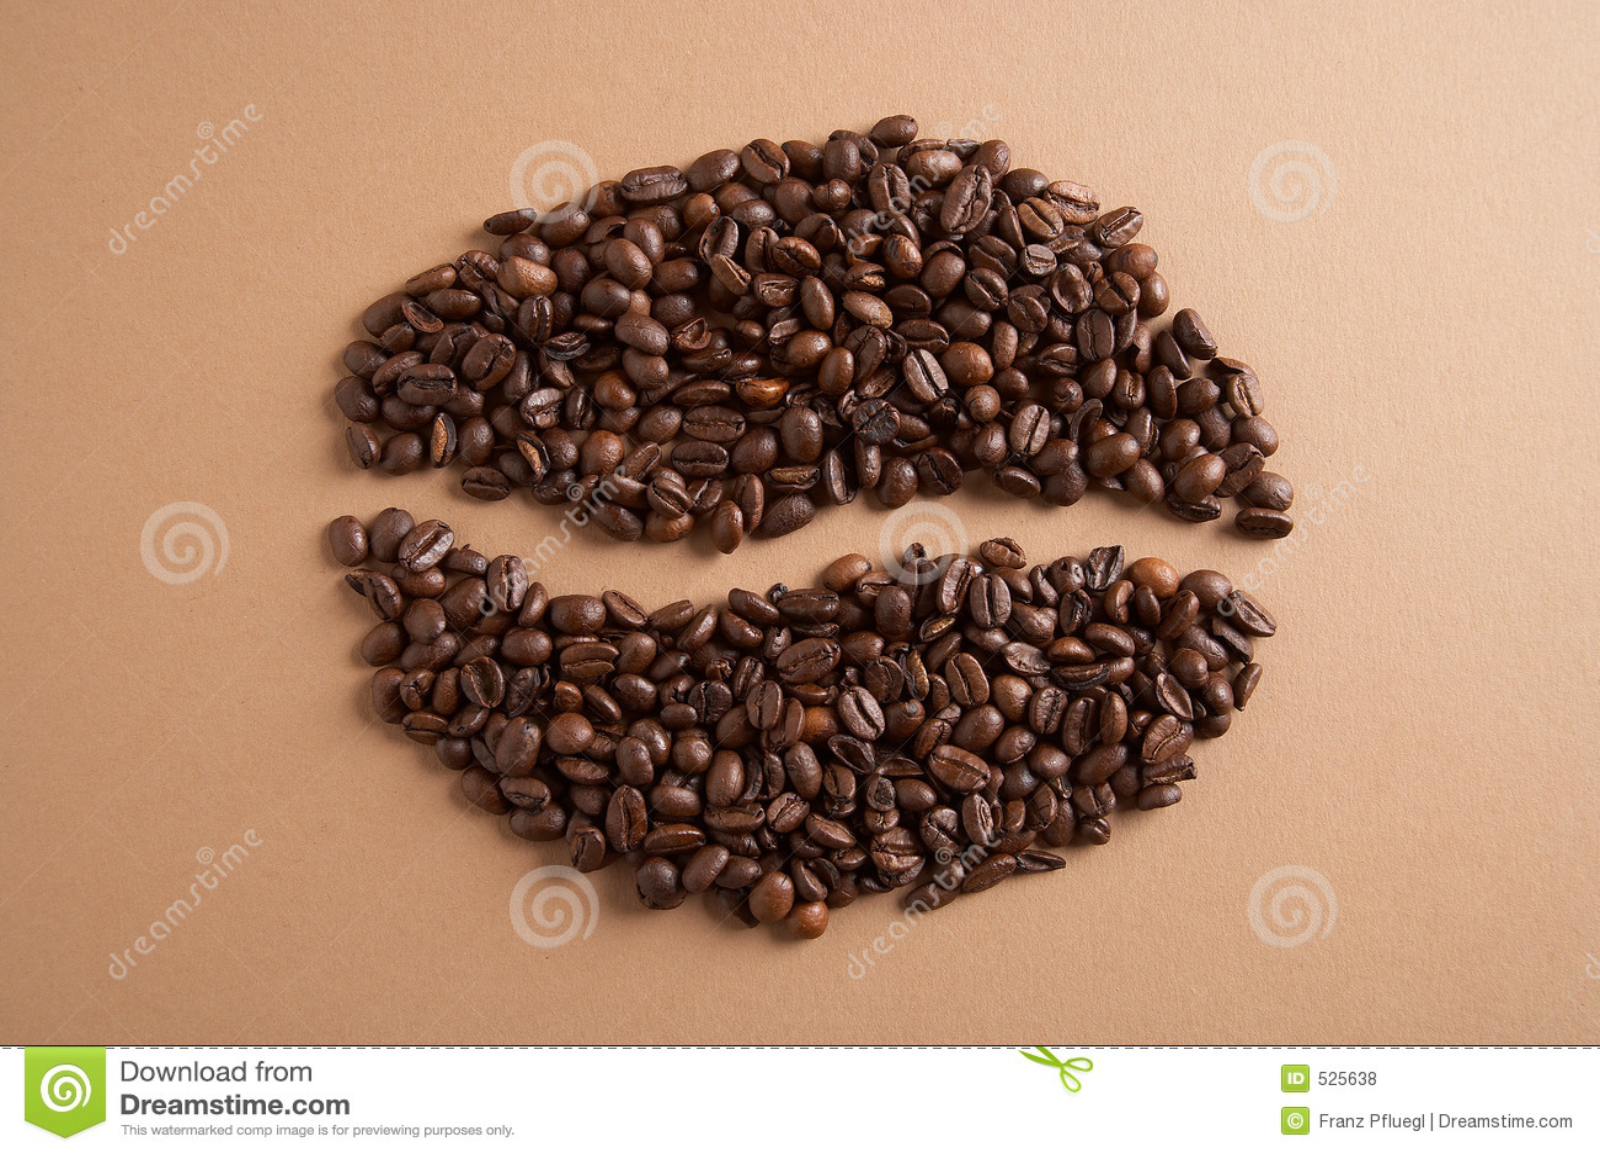 Download Coffeebean kaffebohne 库存照片. 图片 包括有 公平, 符号, 咖啡, 日期, 口味, 烧烤 - 525638